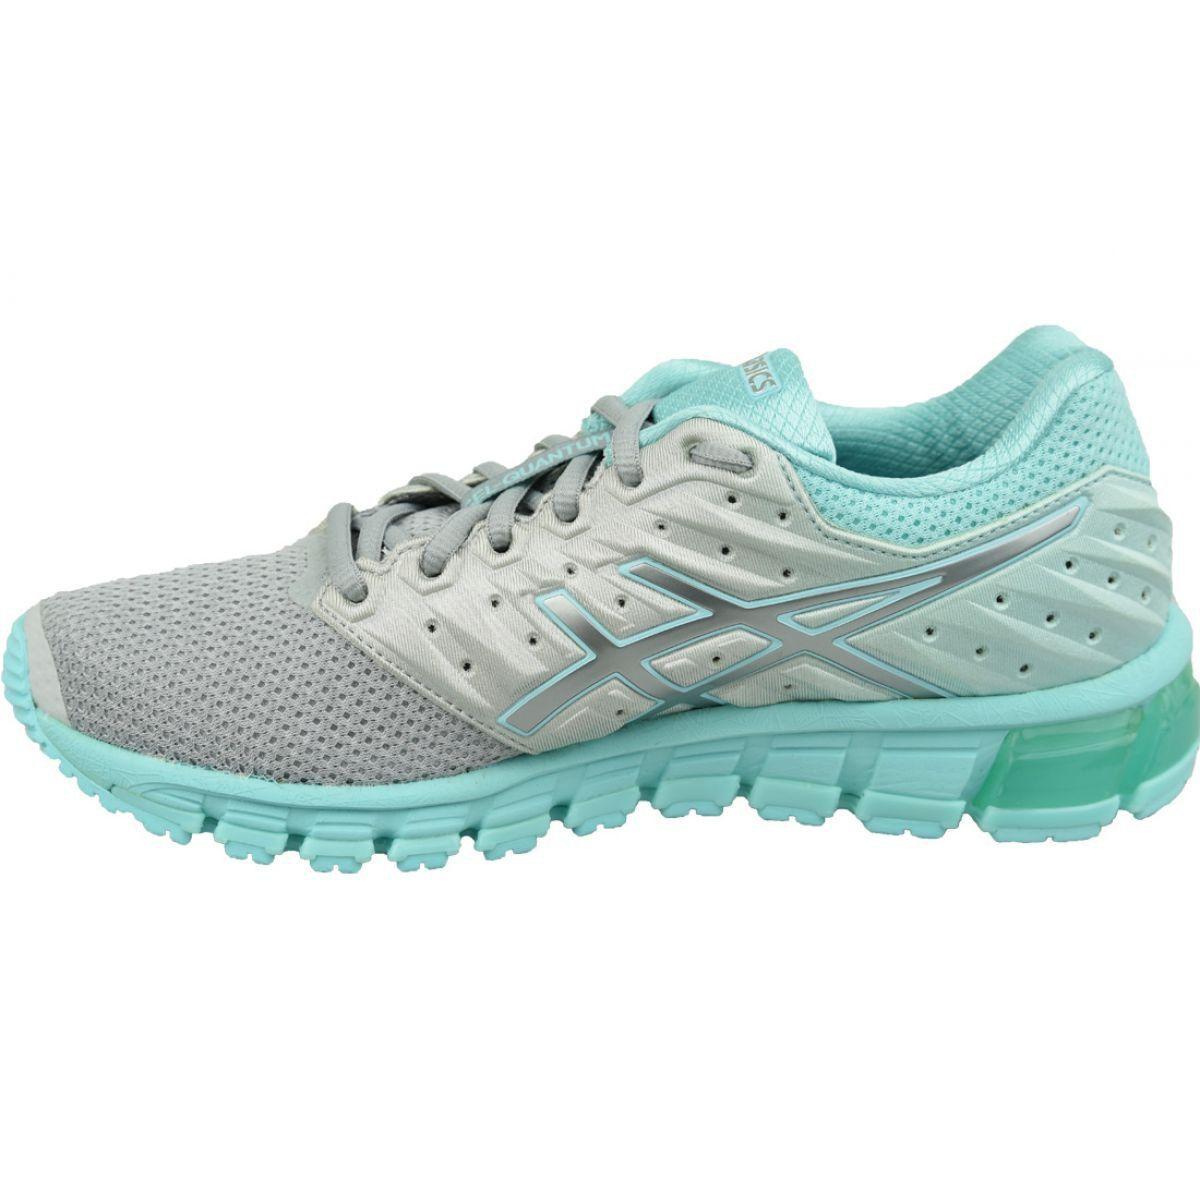 Asics Gel Quantum 180 2 W Mx T887n 9688 Running Shoes Running